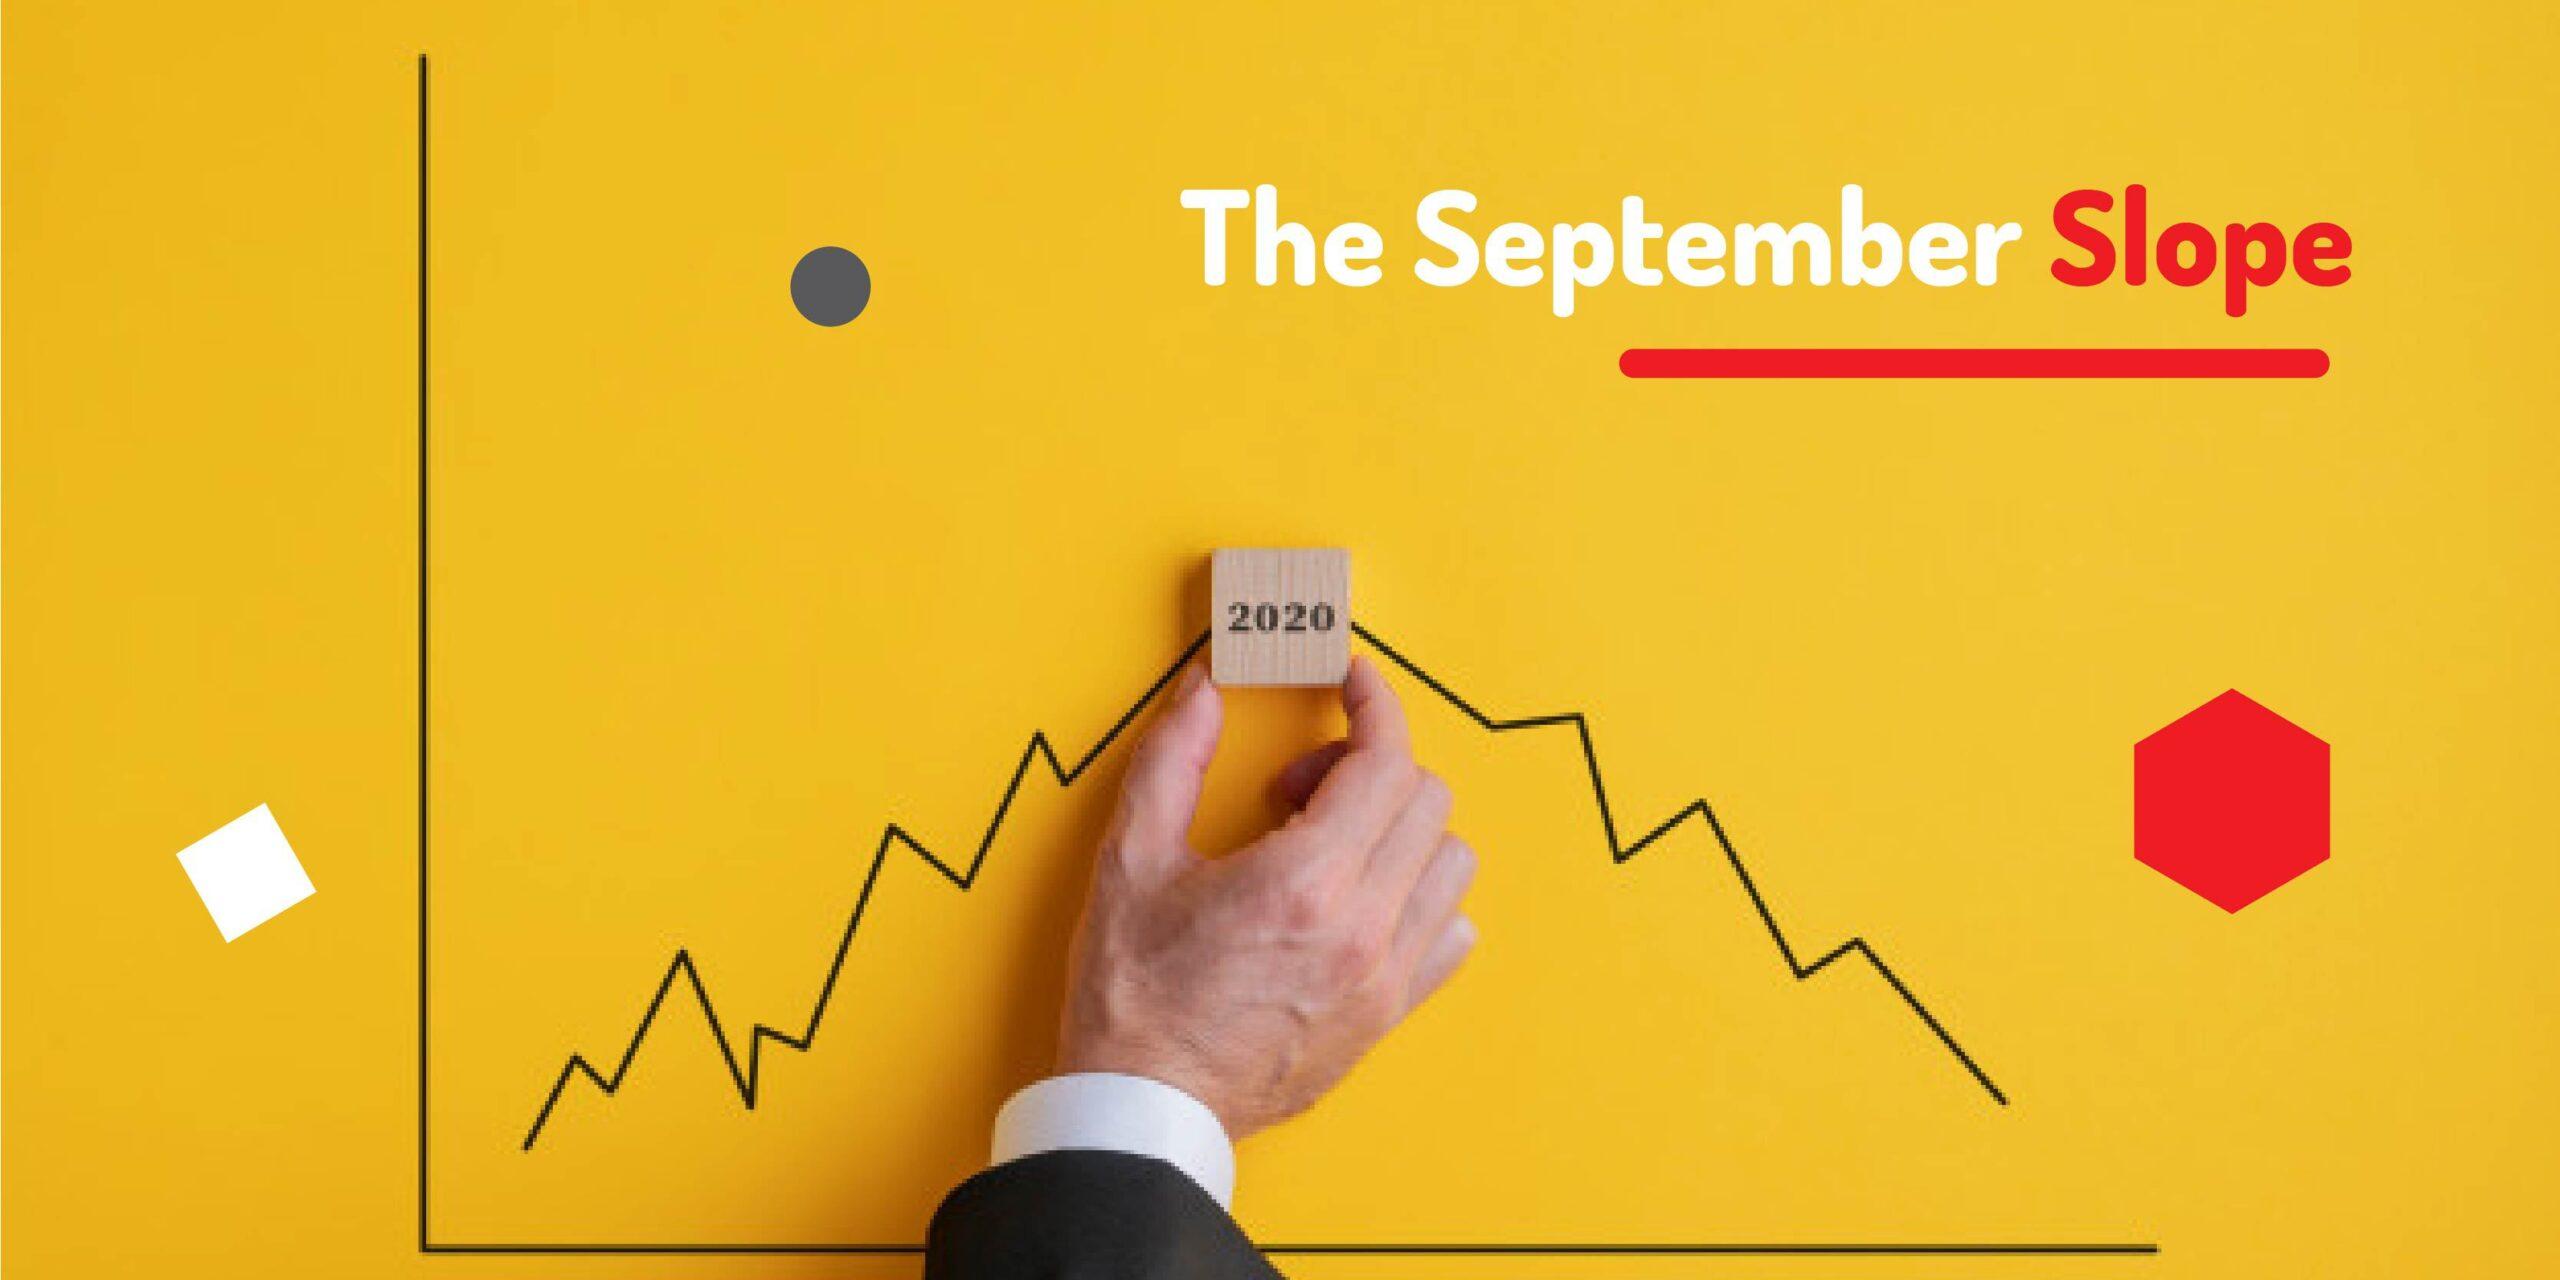 sydney property market september slope